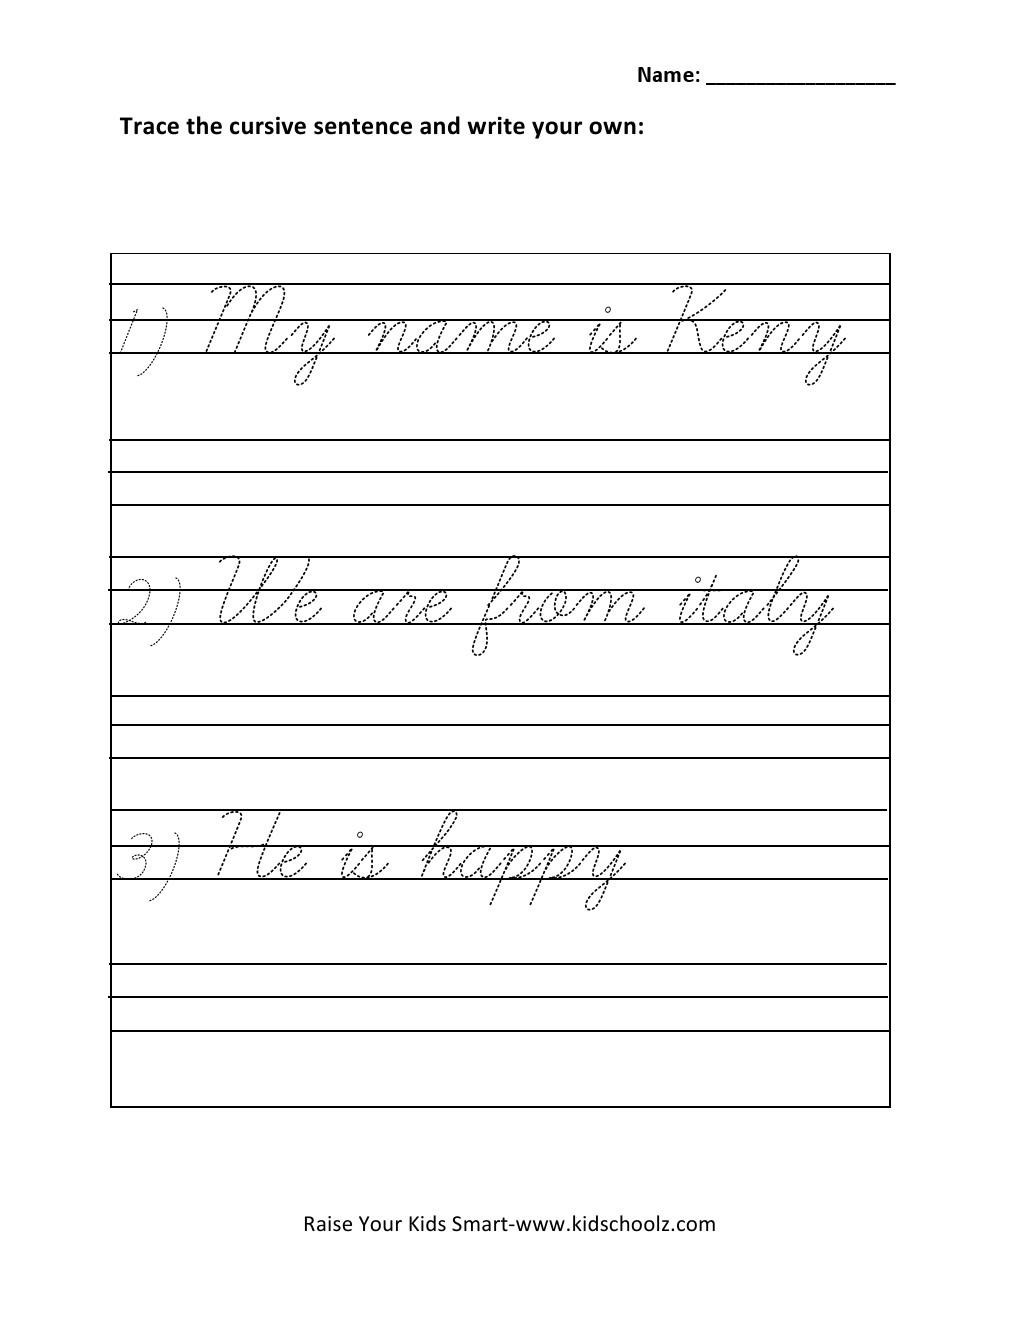 Worksheets Cursive Writing Grade 2 handwriting sentences worksheets